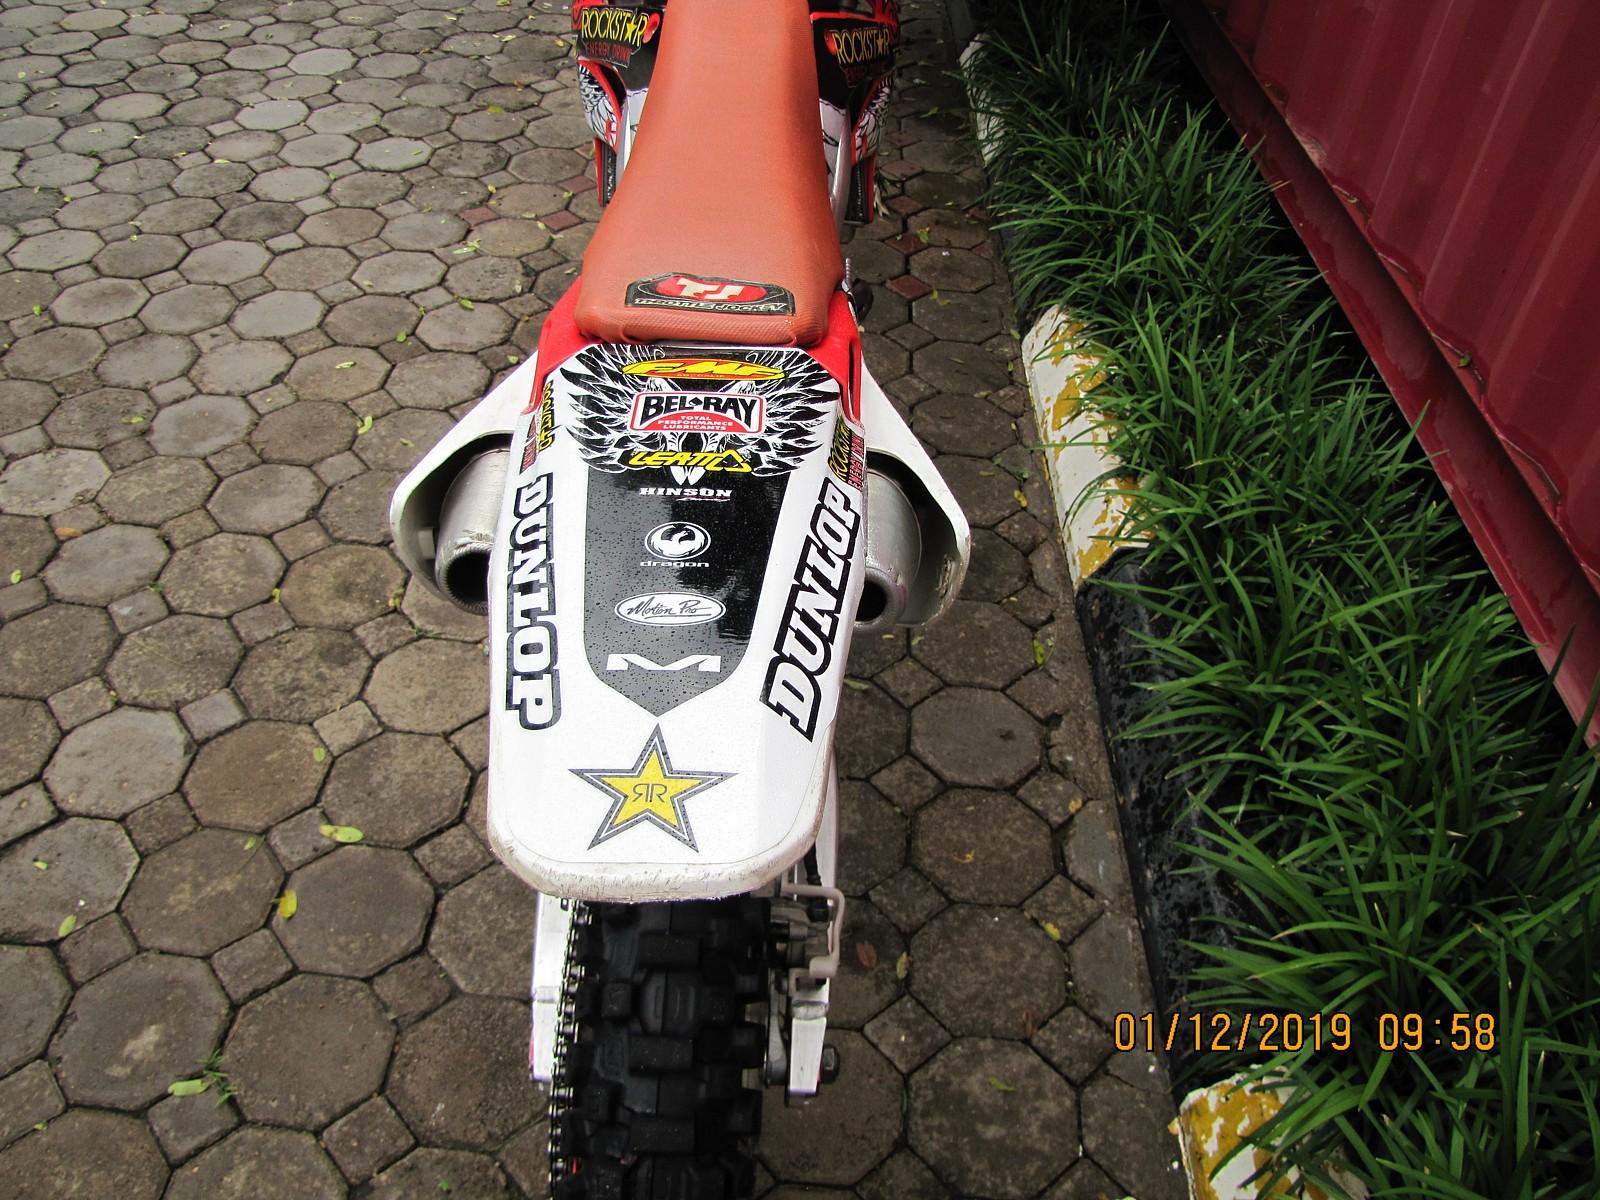 IMG 0006 - banny wailer - Motocross Pictures - Vital MX